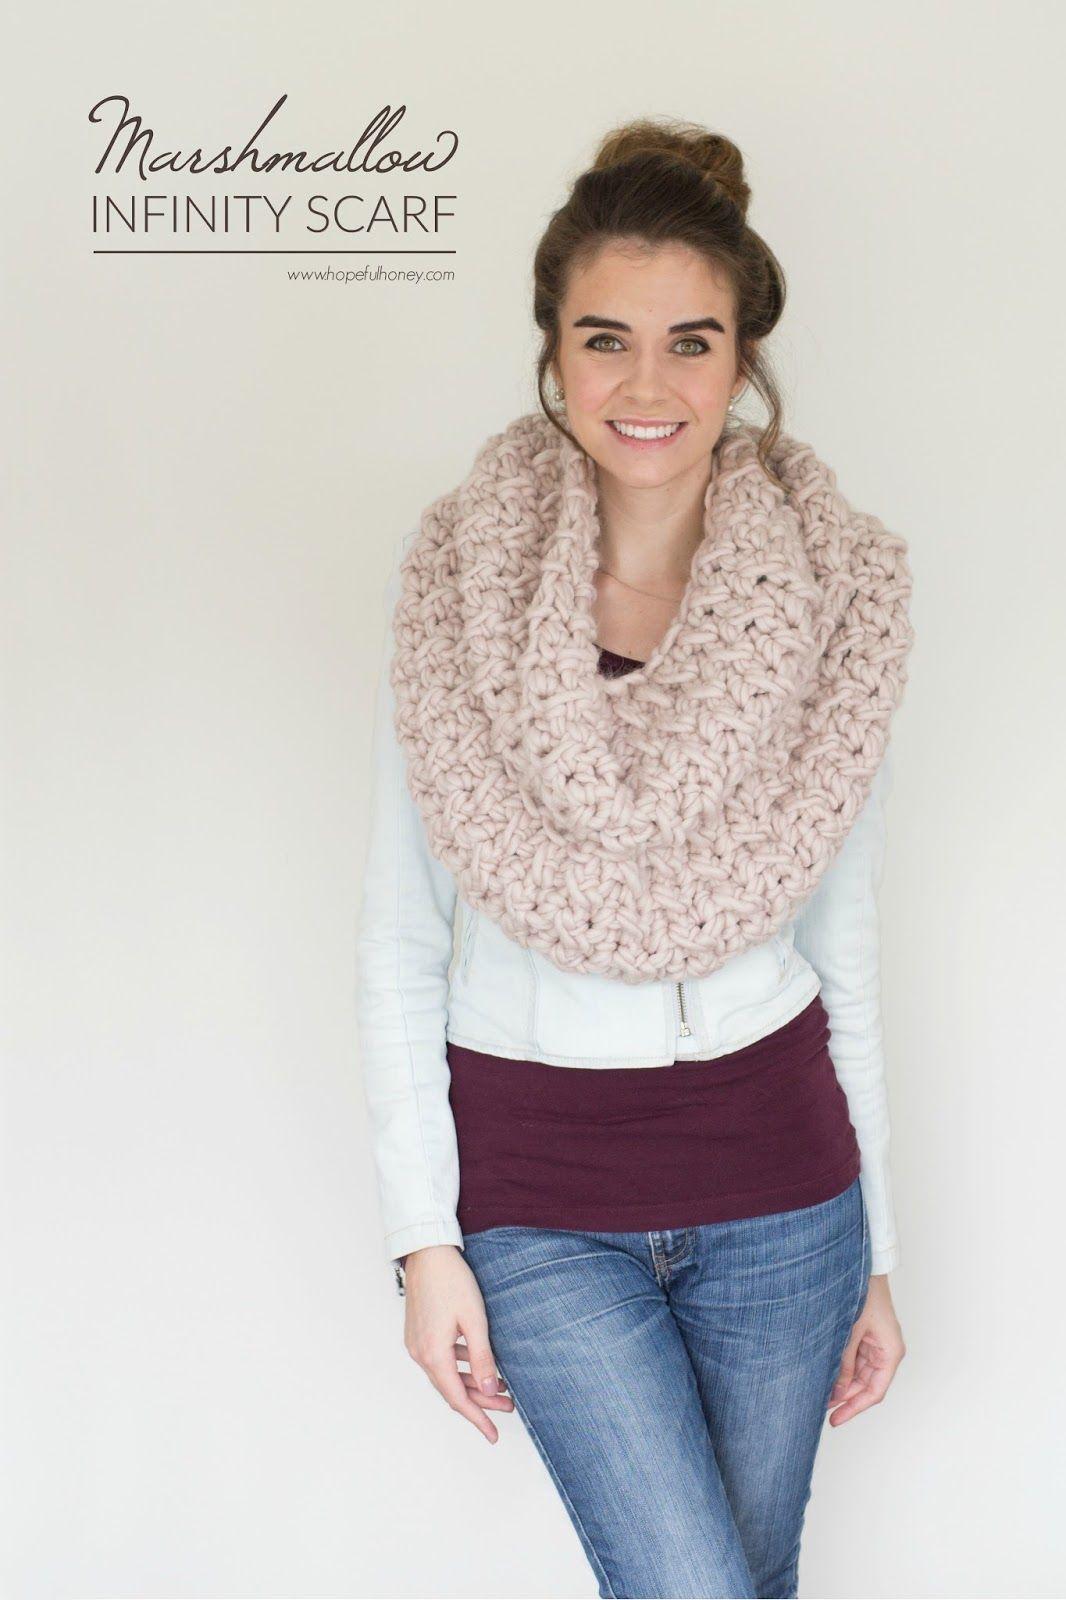 Marshmallow Infinity Scarf Crochet Pattern Tücherschals Häkeln